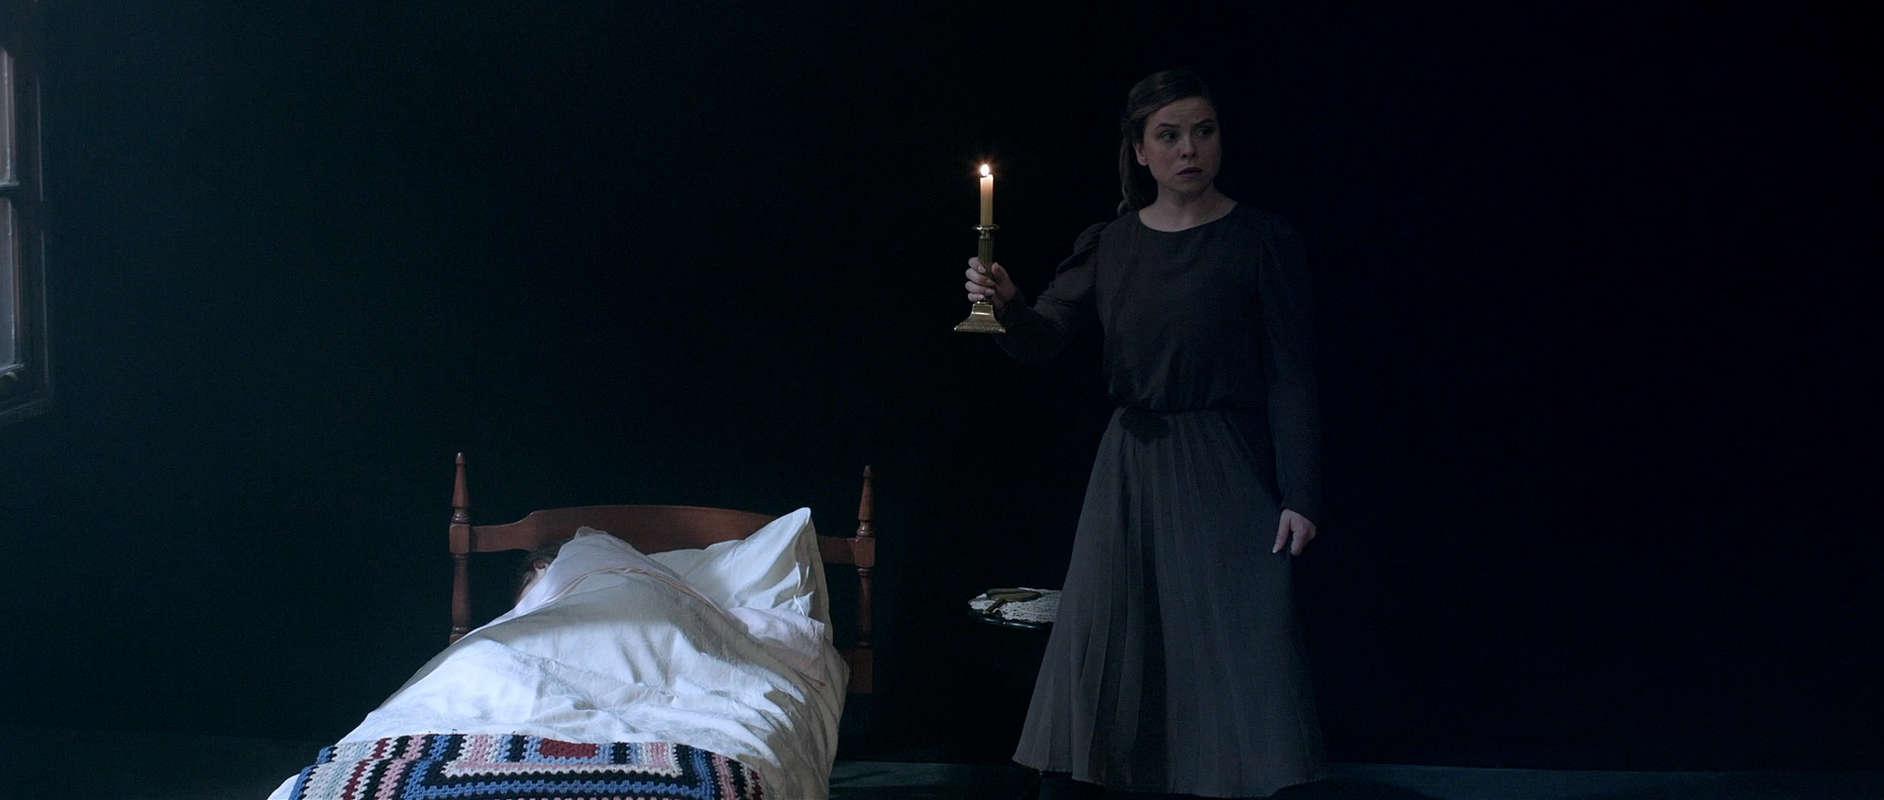 North Carolina's Wreak Havoc Horror Film Festival Brings on the Frights